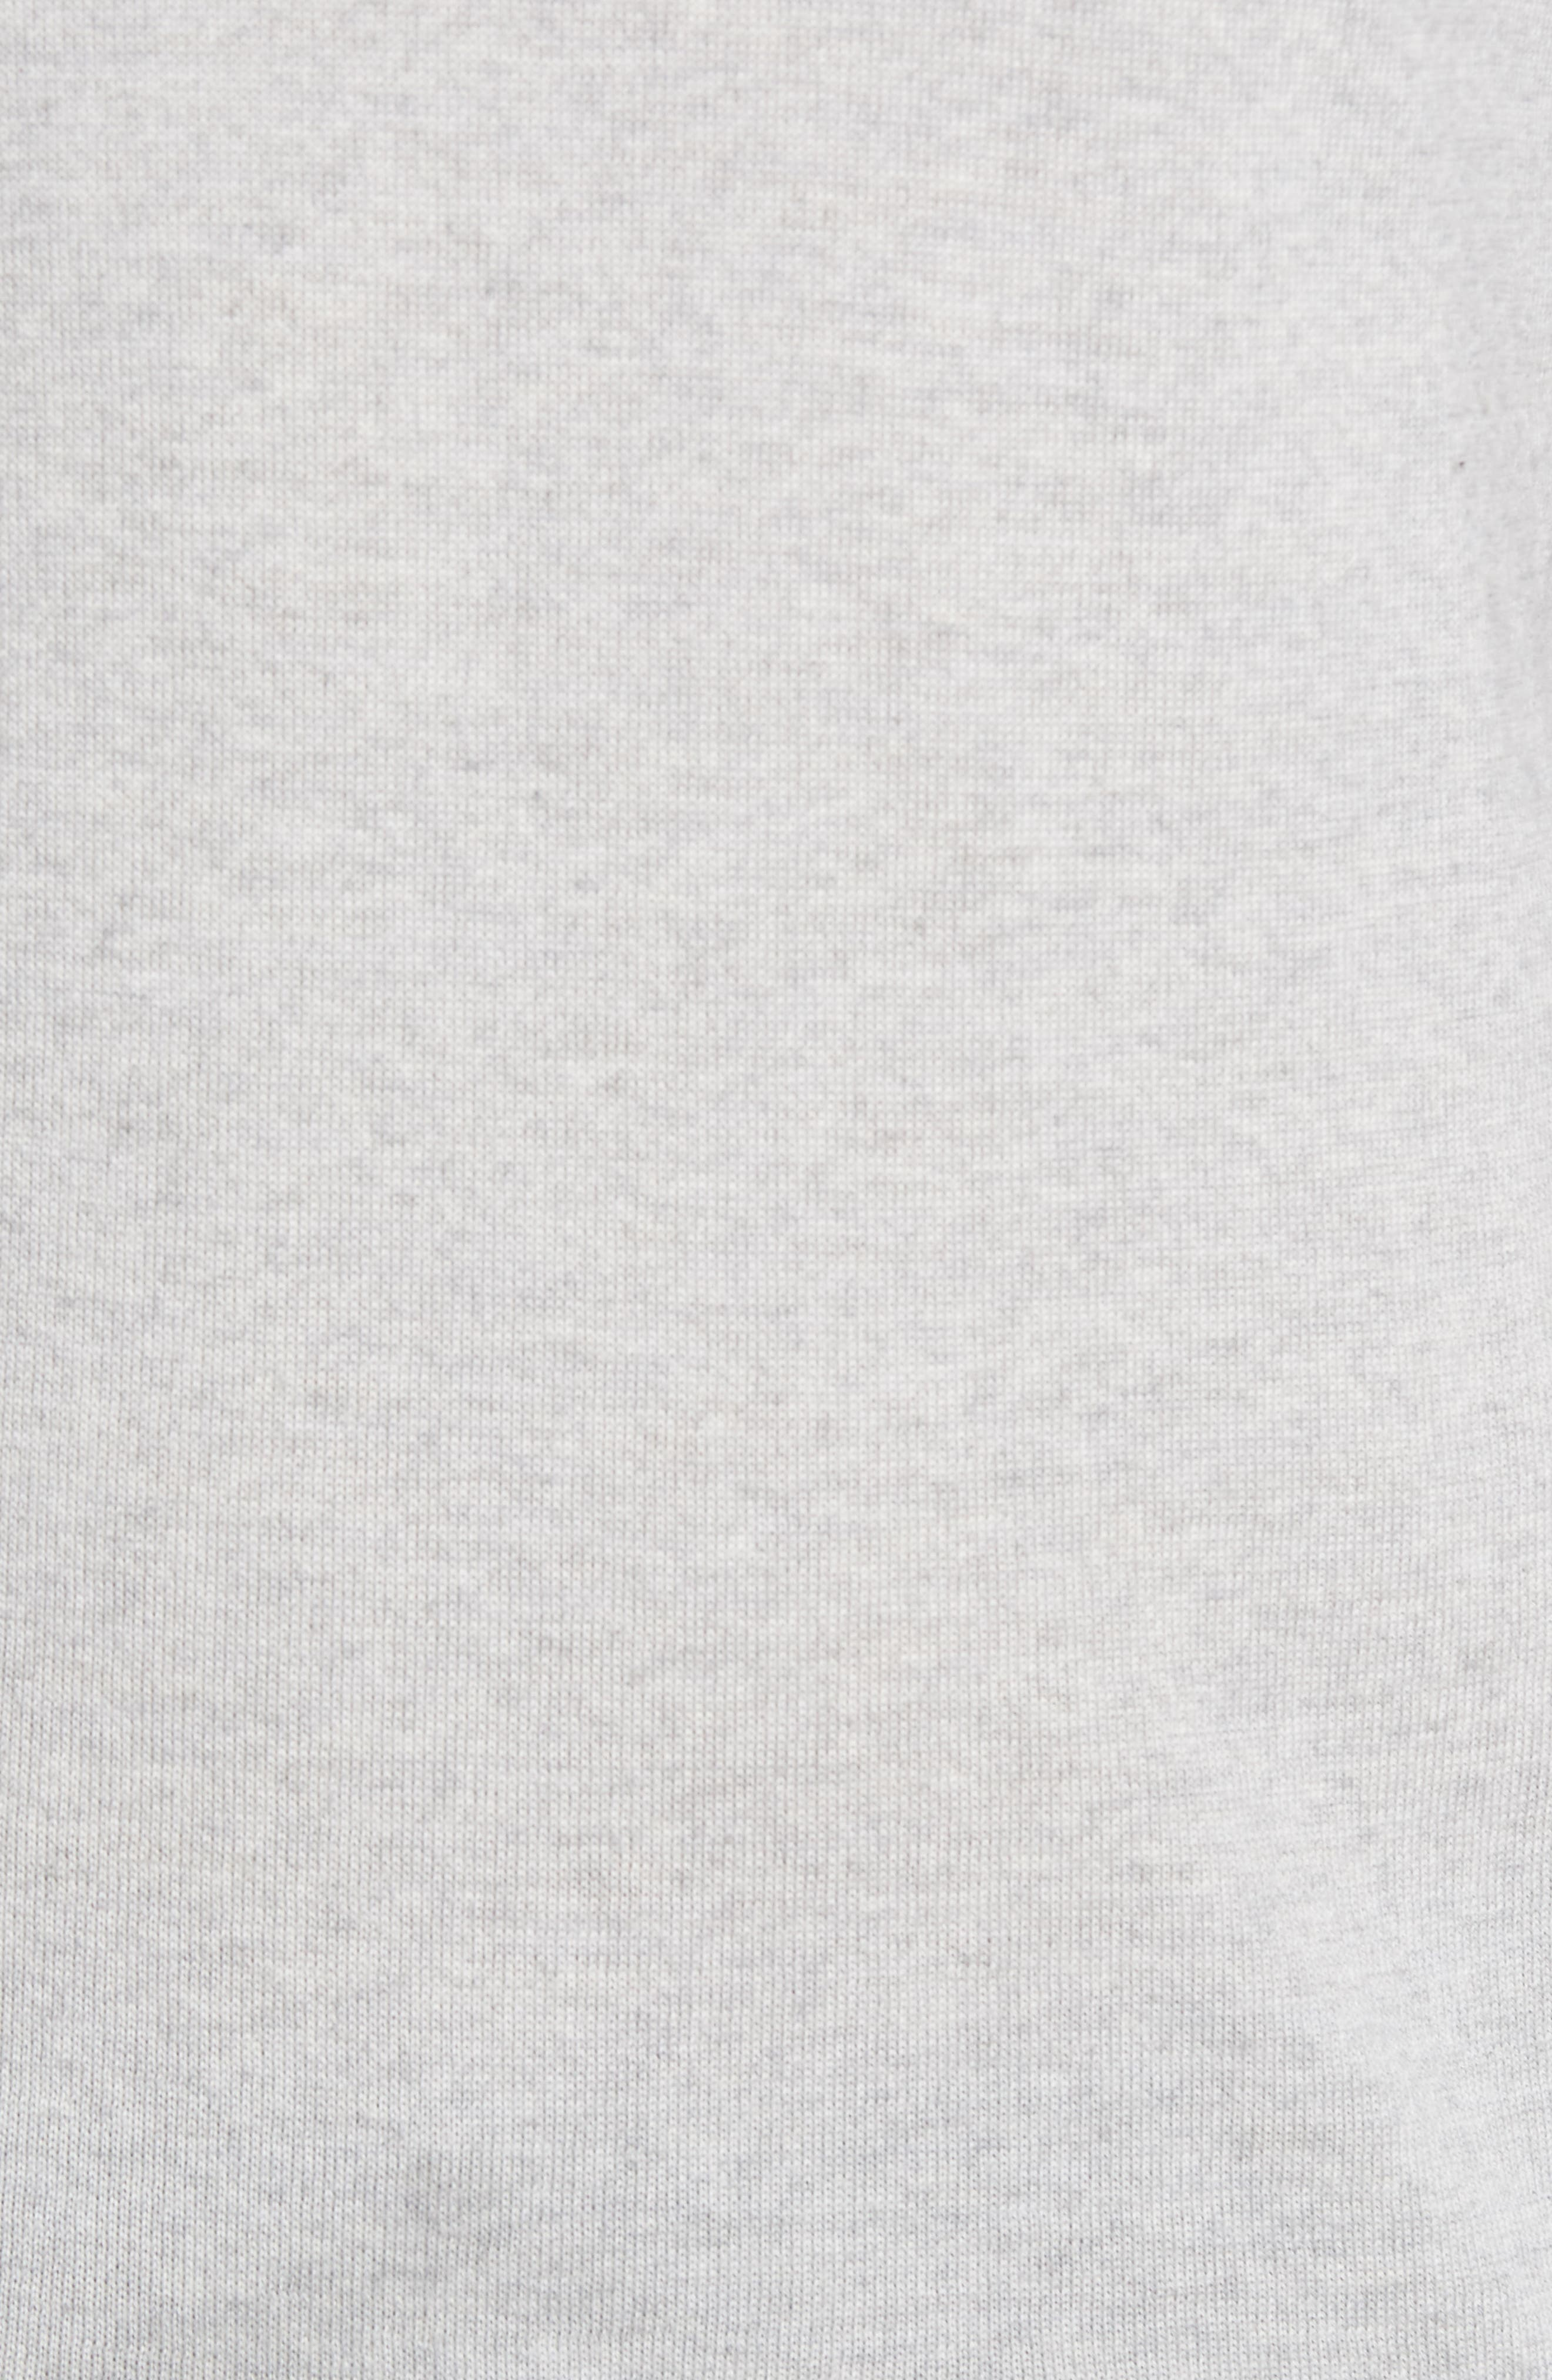 Virgin Wool Crewneck Sweater,                             Alternate thumbnail 5, color,                             Light Grey